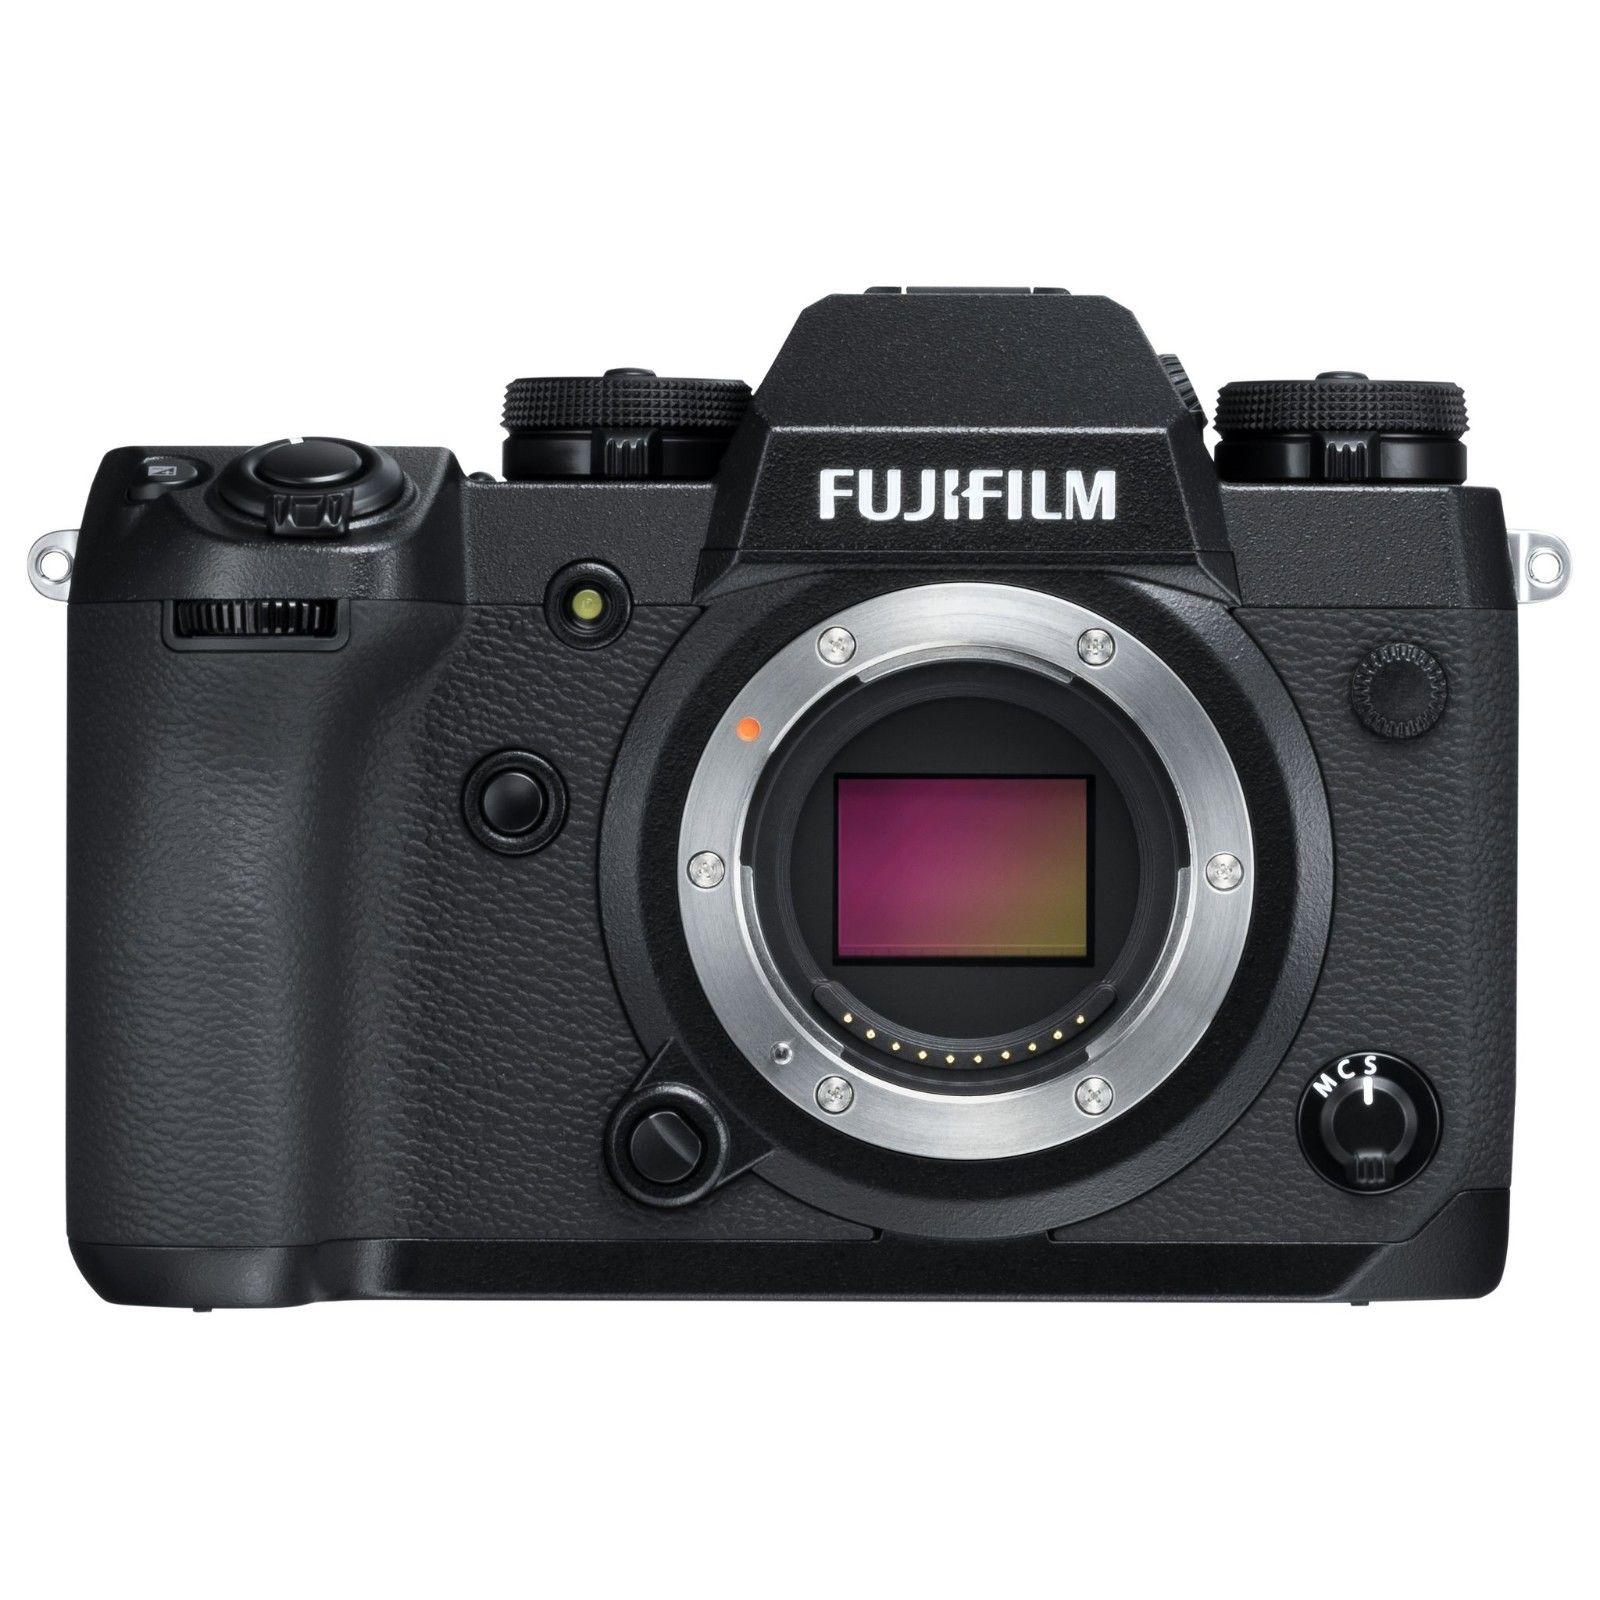 Fujifilm Fuji X-H1 15 Auslösungen NEU OVP Rechnung 24 Monate Garantie